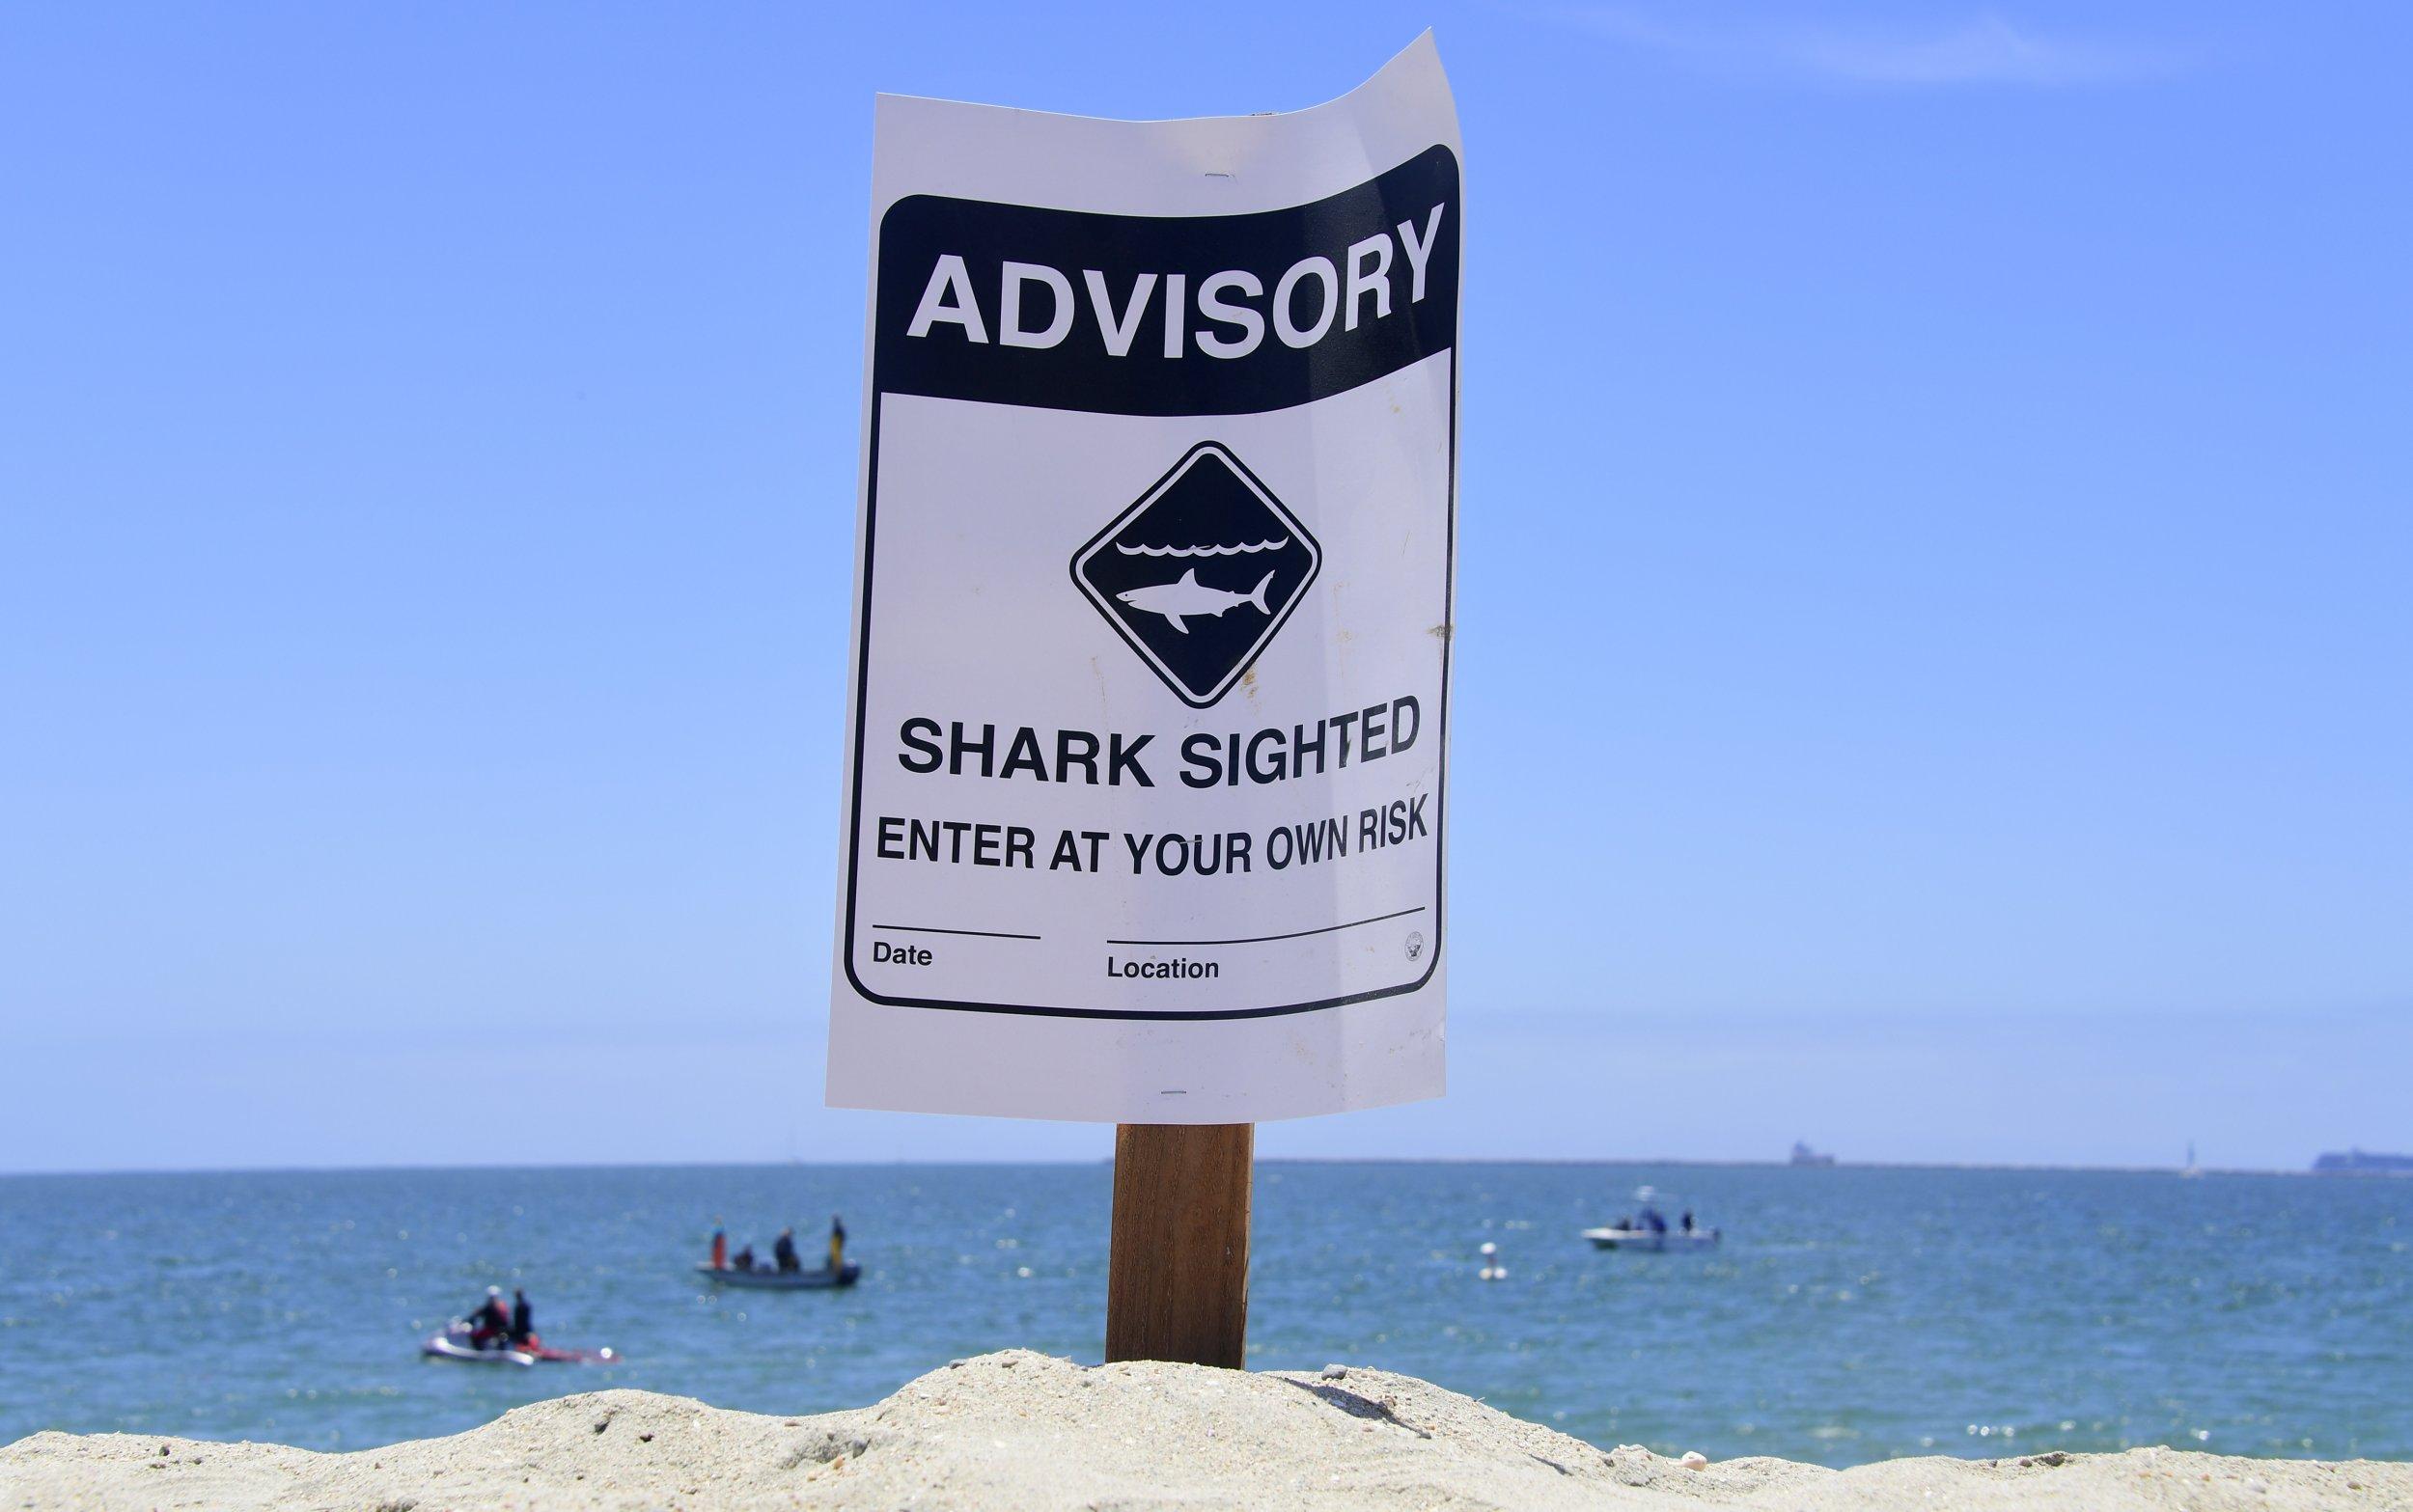 Man bitten by shark at Crystal Beach in Texas